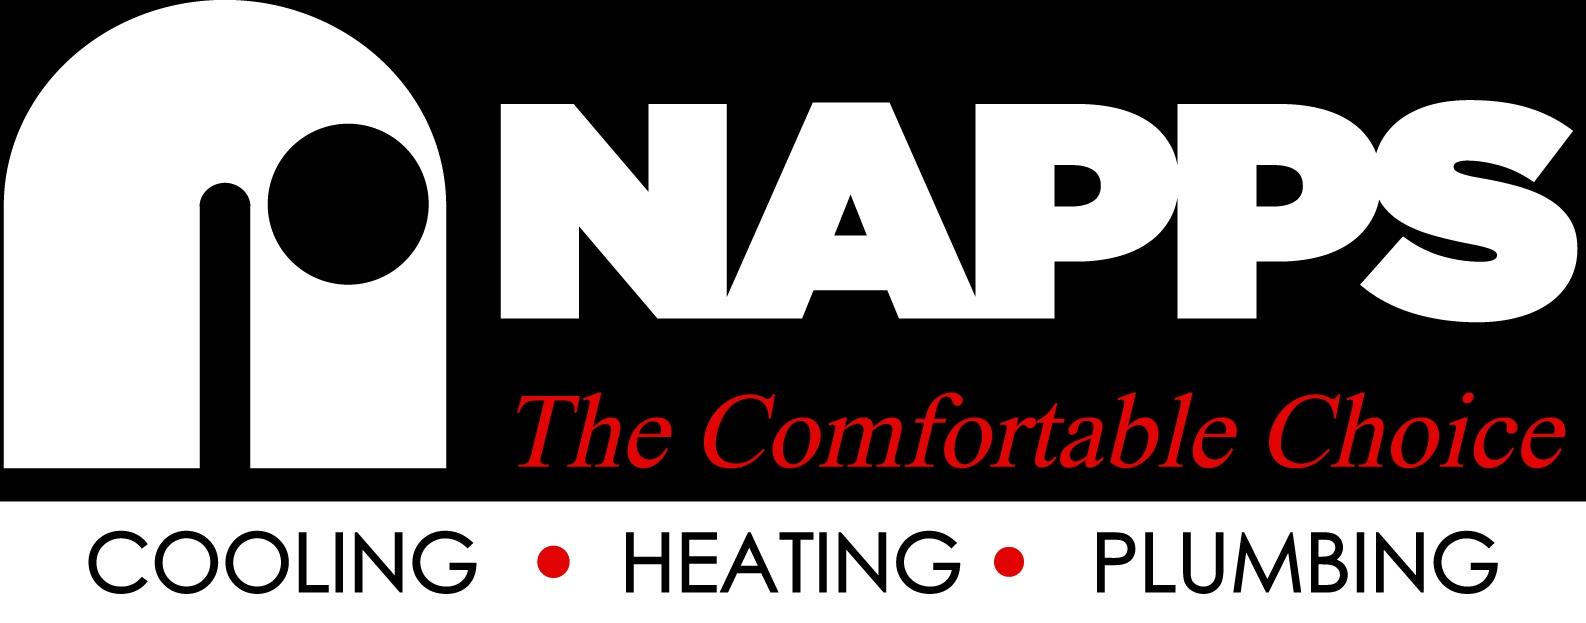 Napps Cooling Heating Plumbing Longview Tx